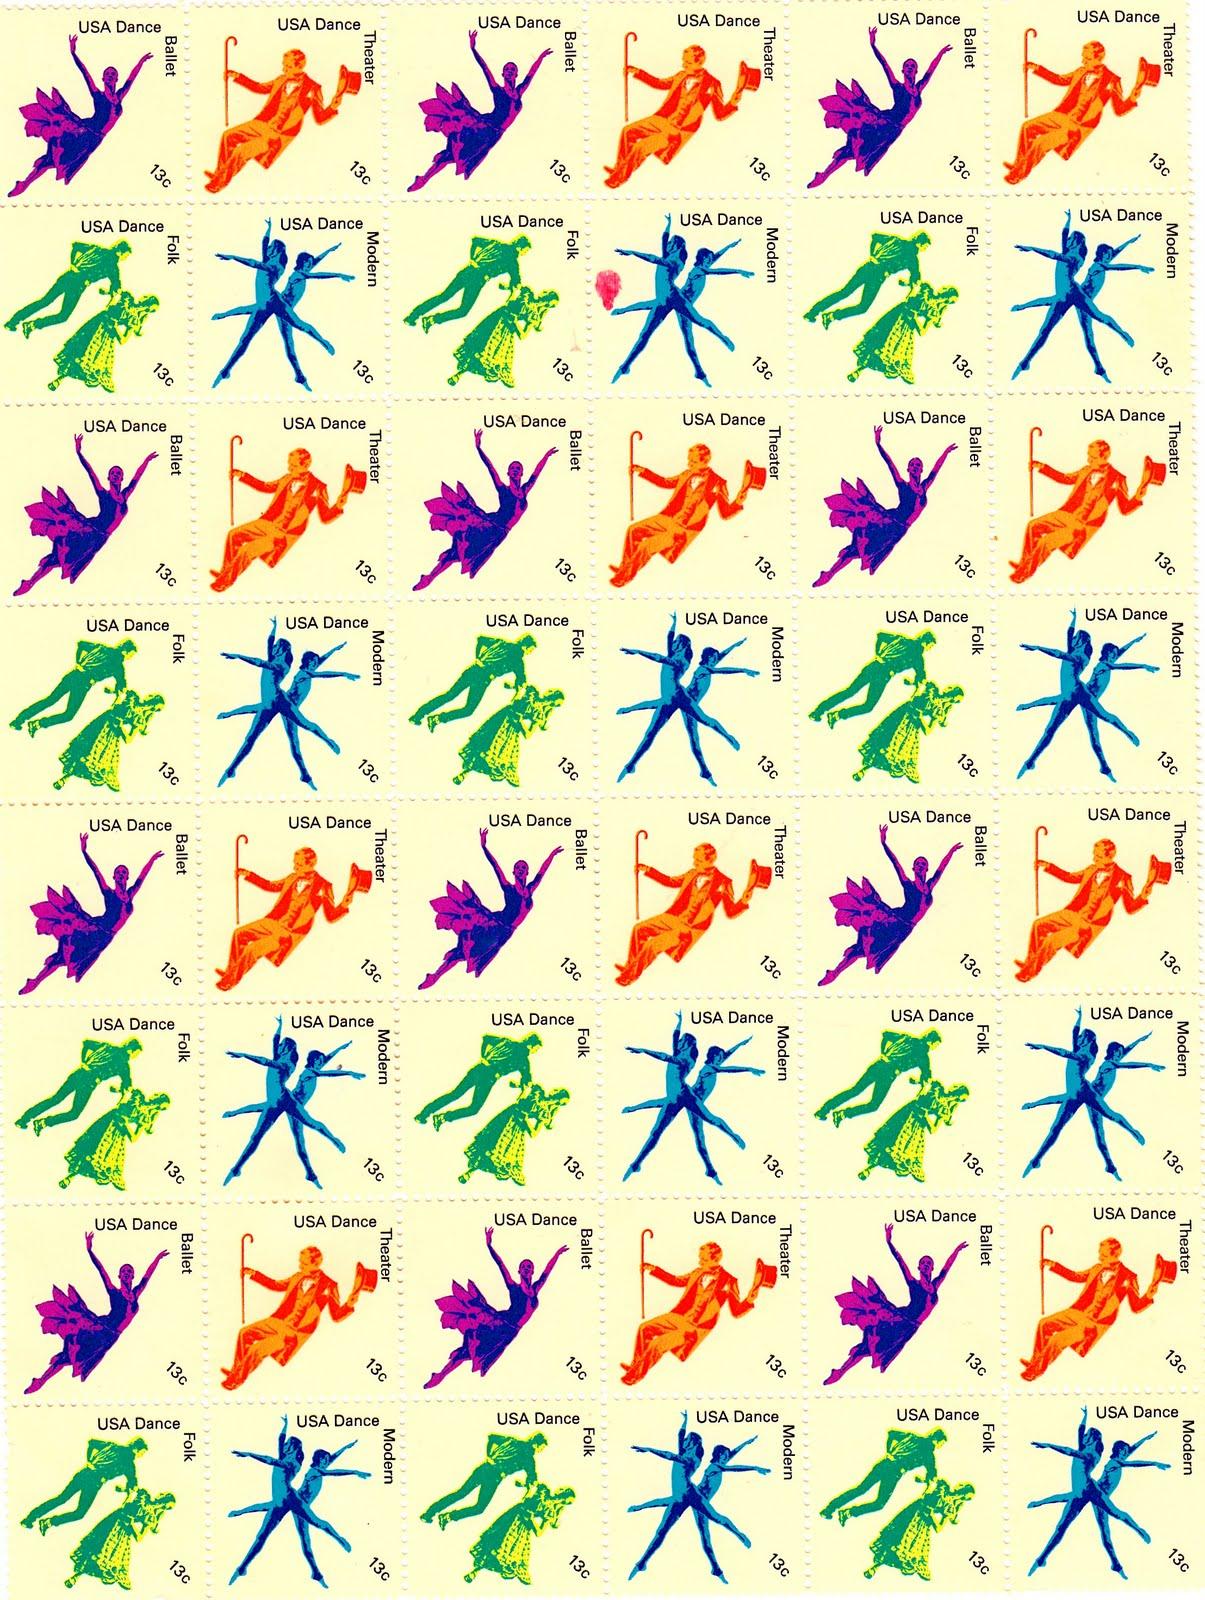 http://3.bp.blogspot.com/-CAcz1fBHMf0/TaL70LIygFI/AAAAAAAABYo/CiRtxTLpe3k/s1600/Seventies+Stamps_0012_NEW+-+Copy.jpg